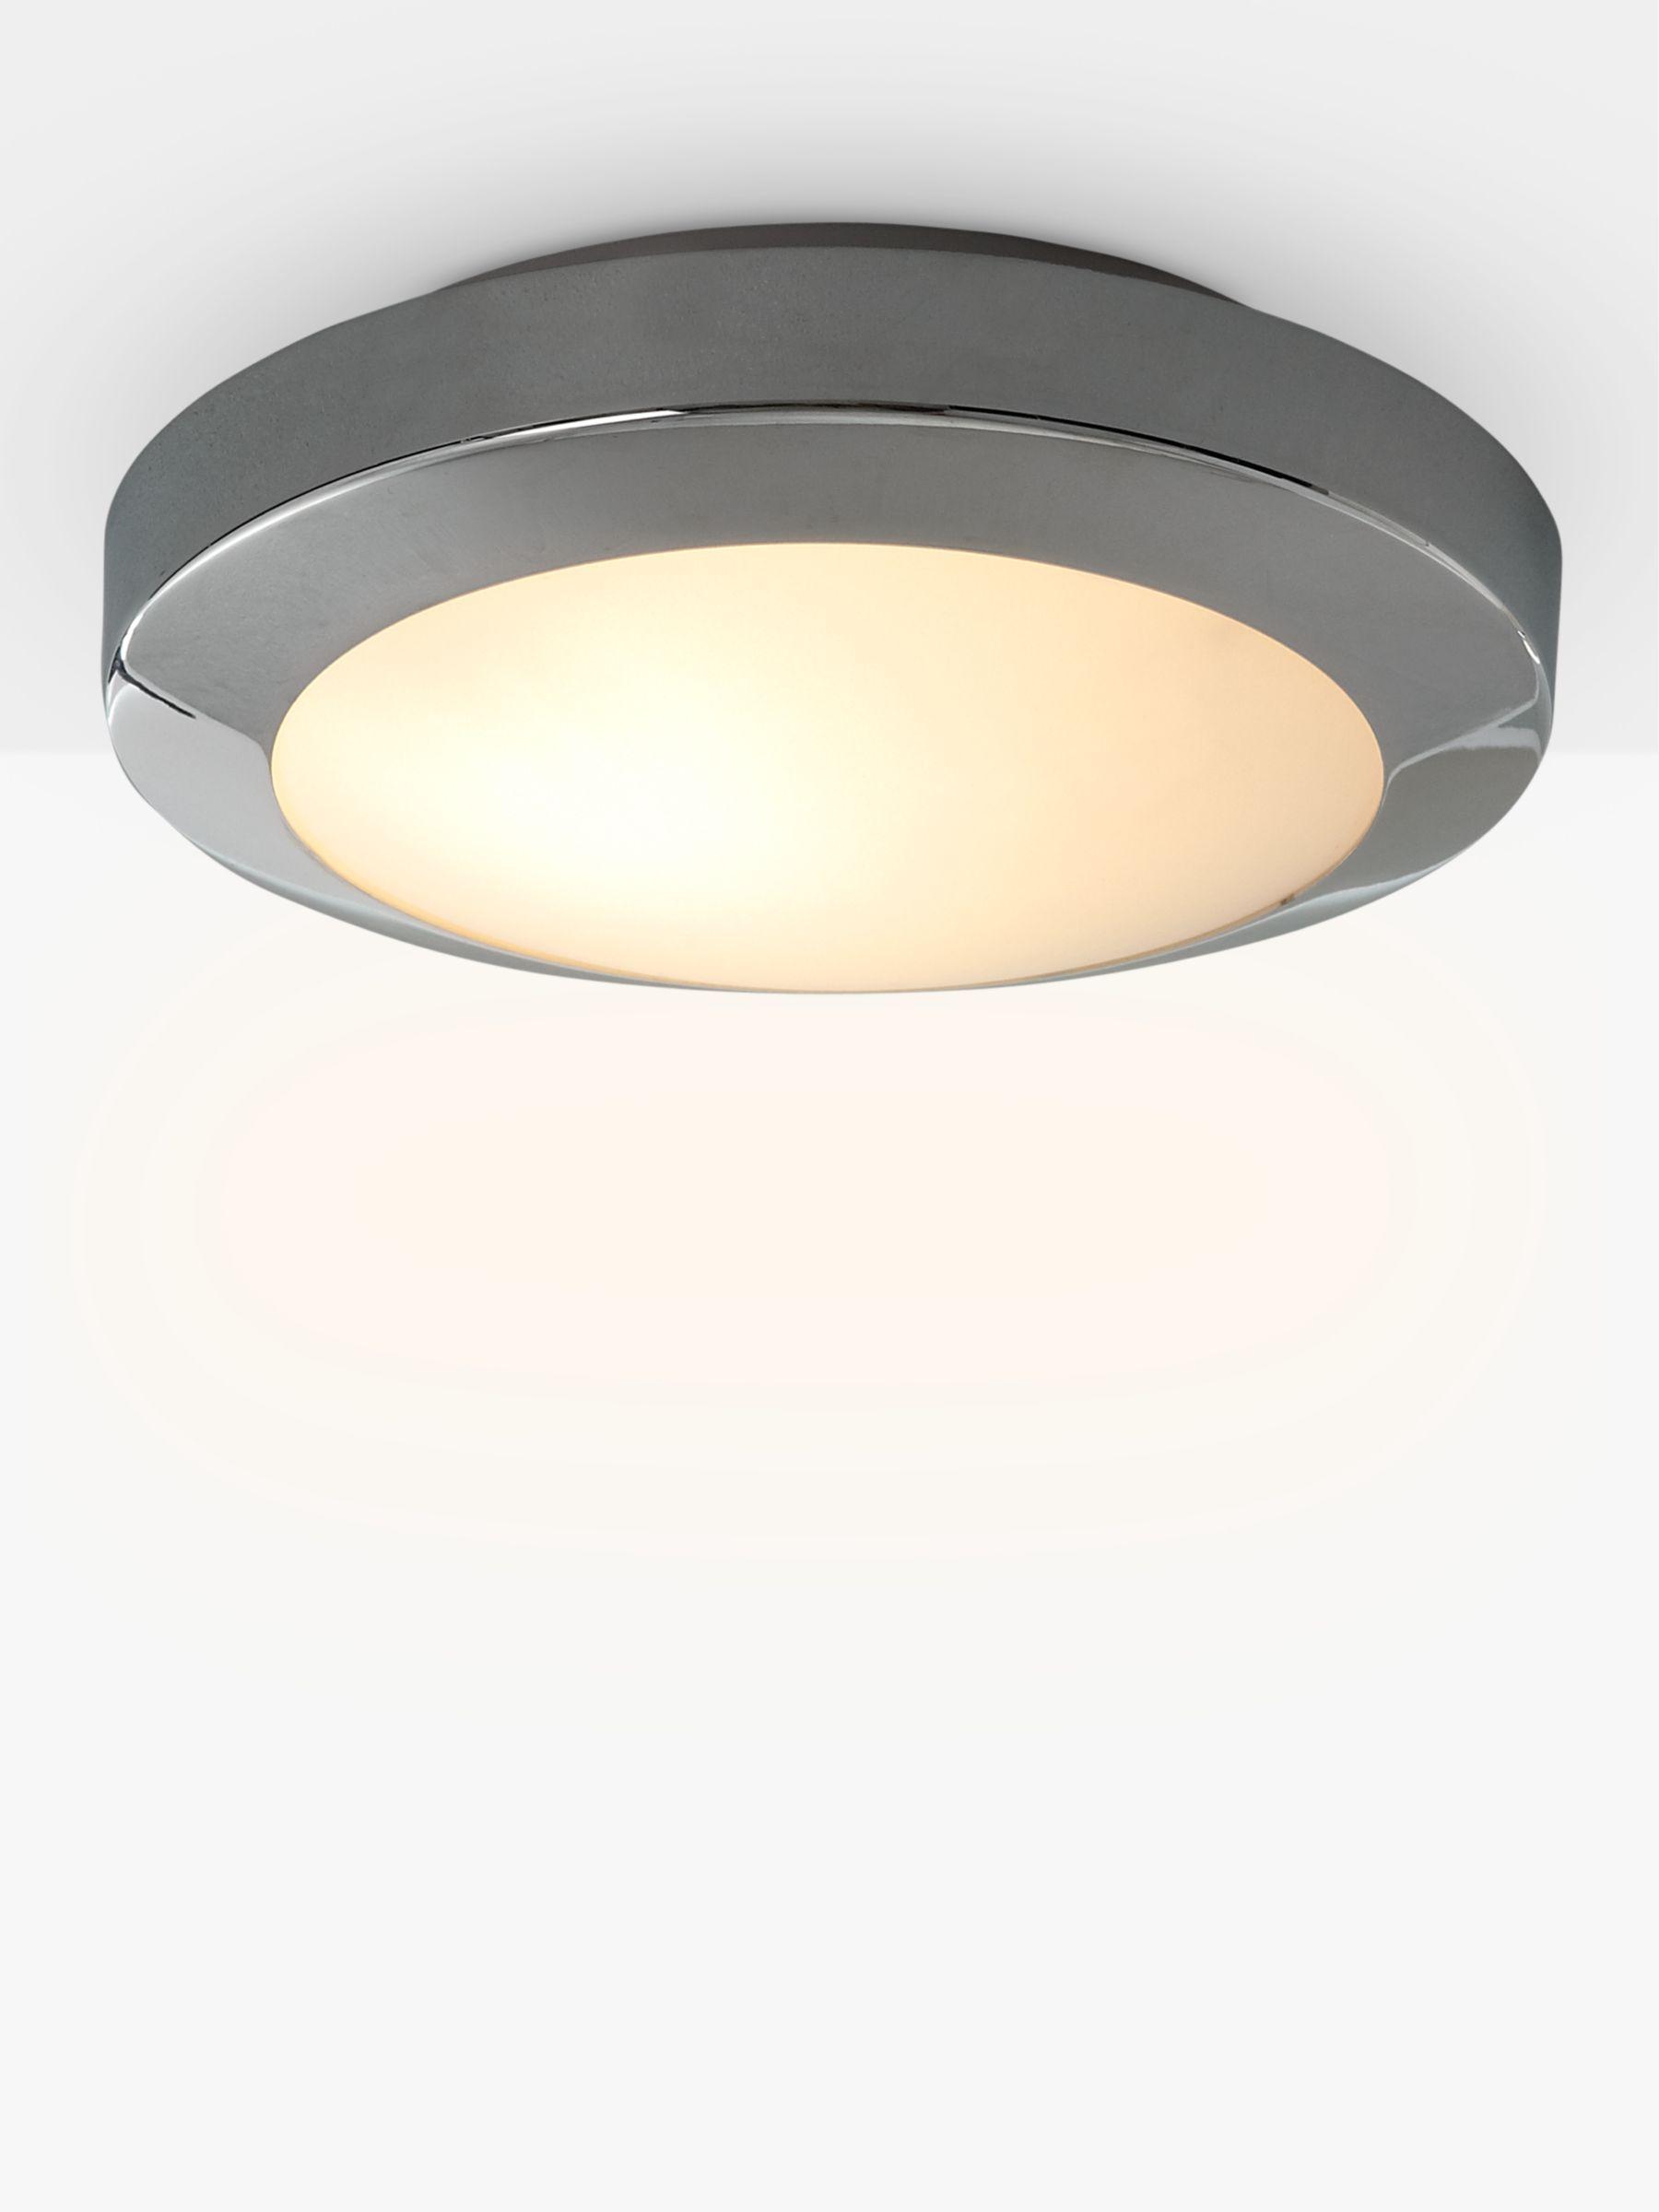 ASTRO Astro Dakota Bathroom Light